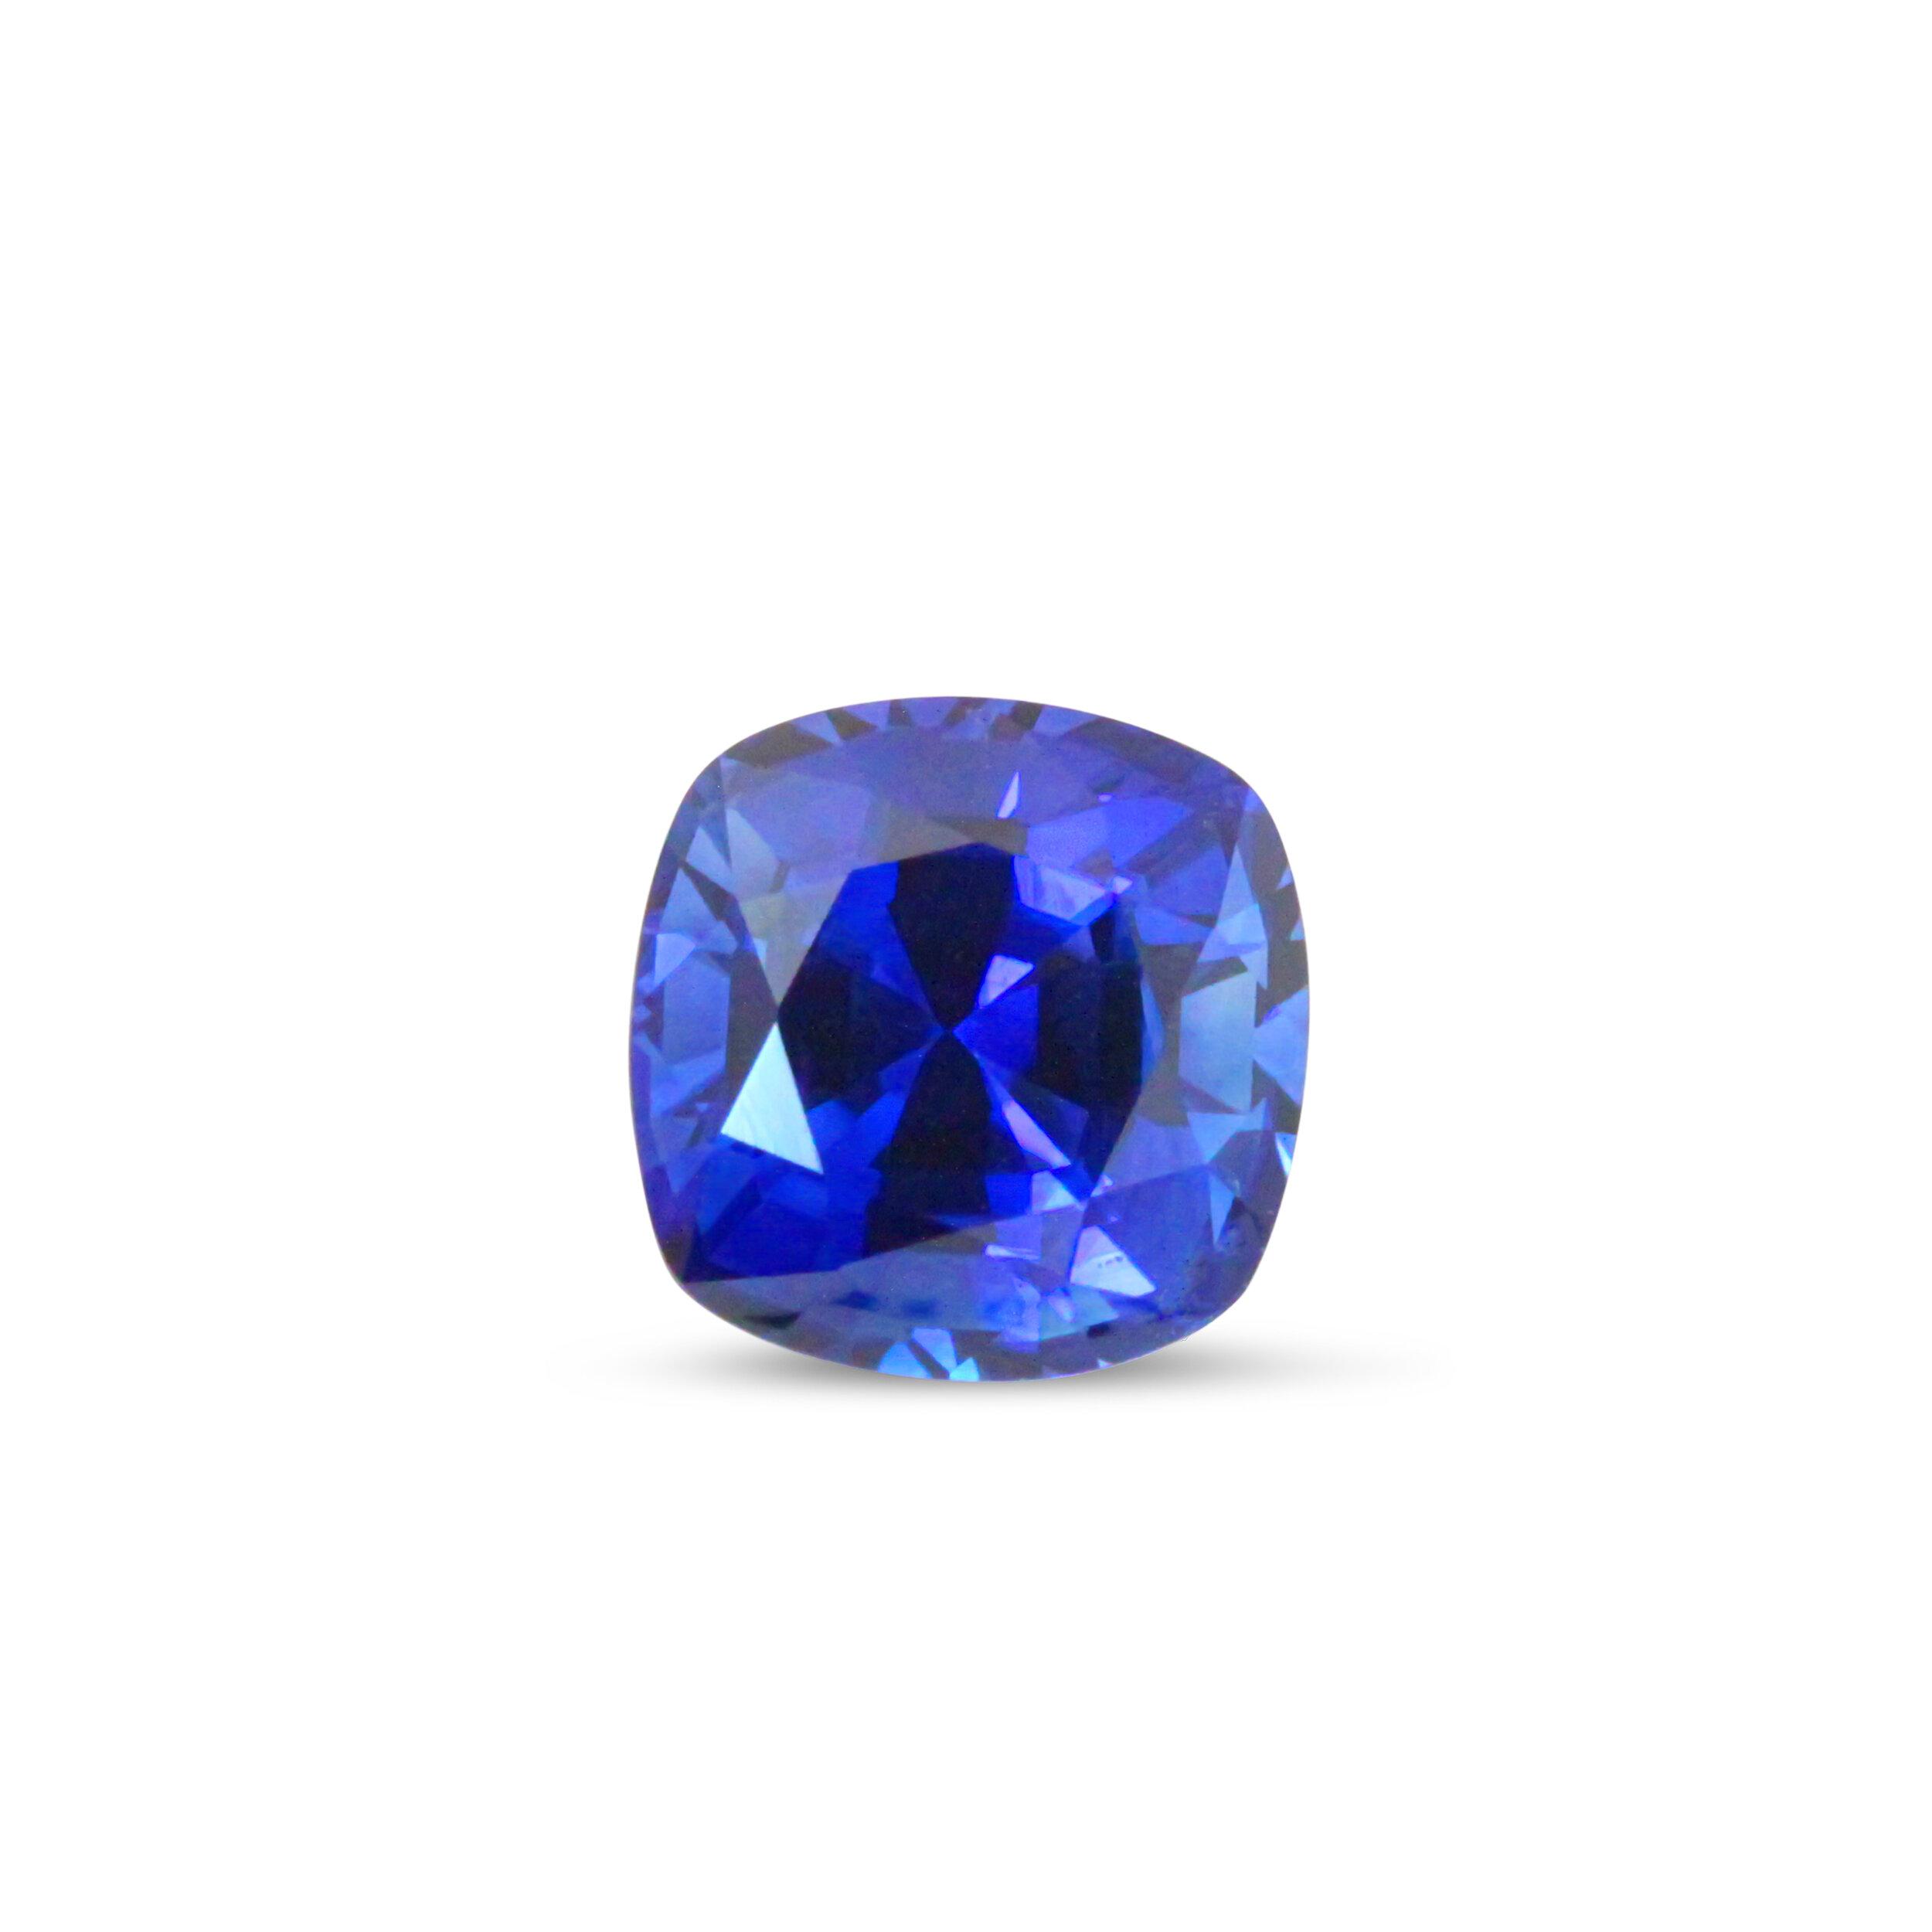 2.50 ct Unheated Ceylon Sapphire, GIA